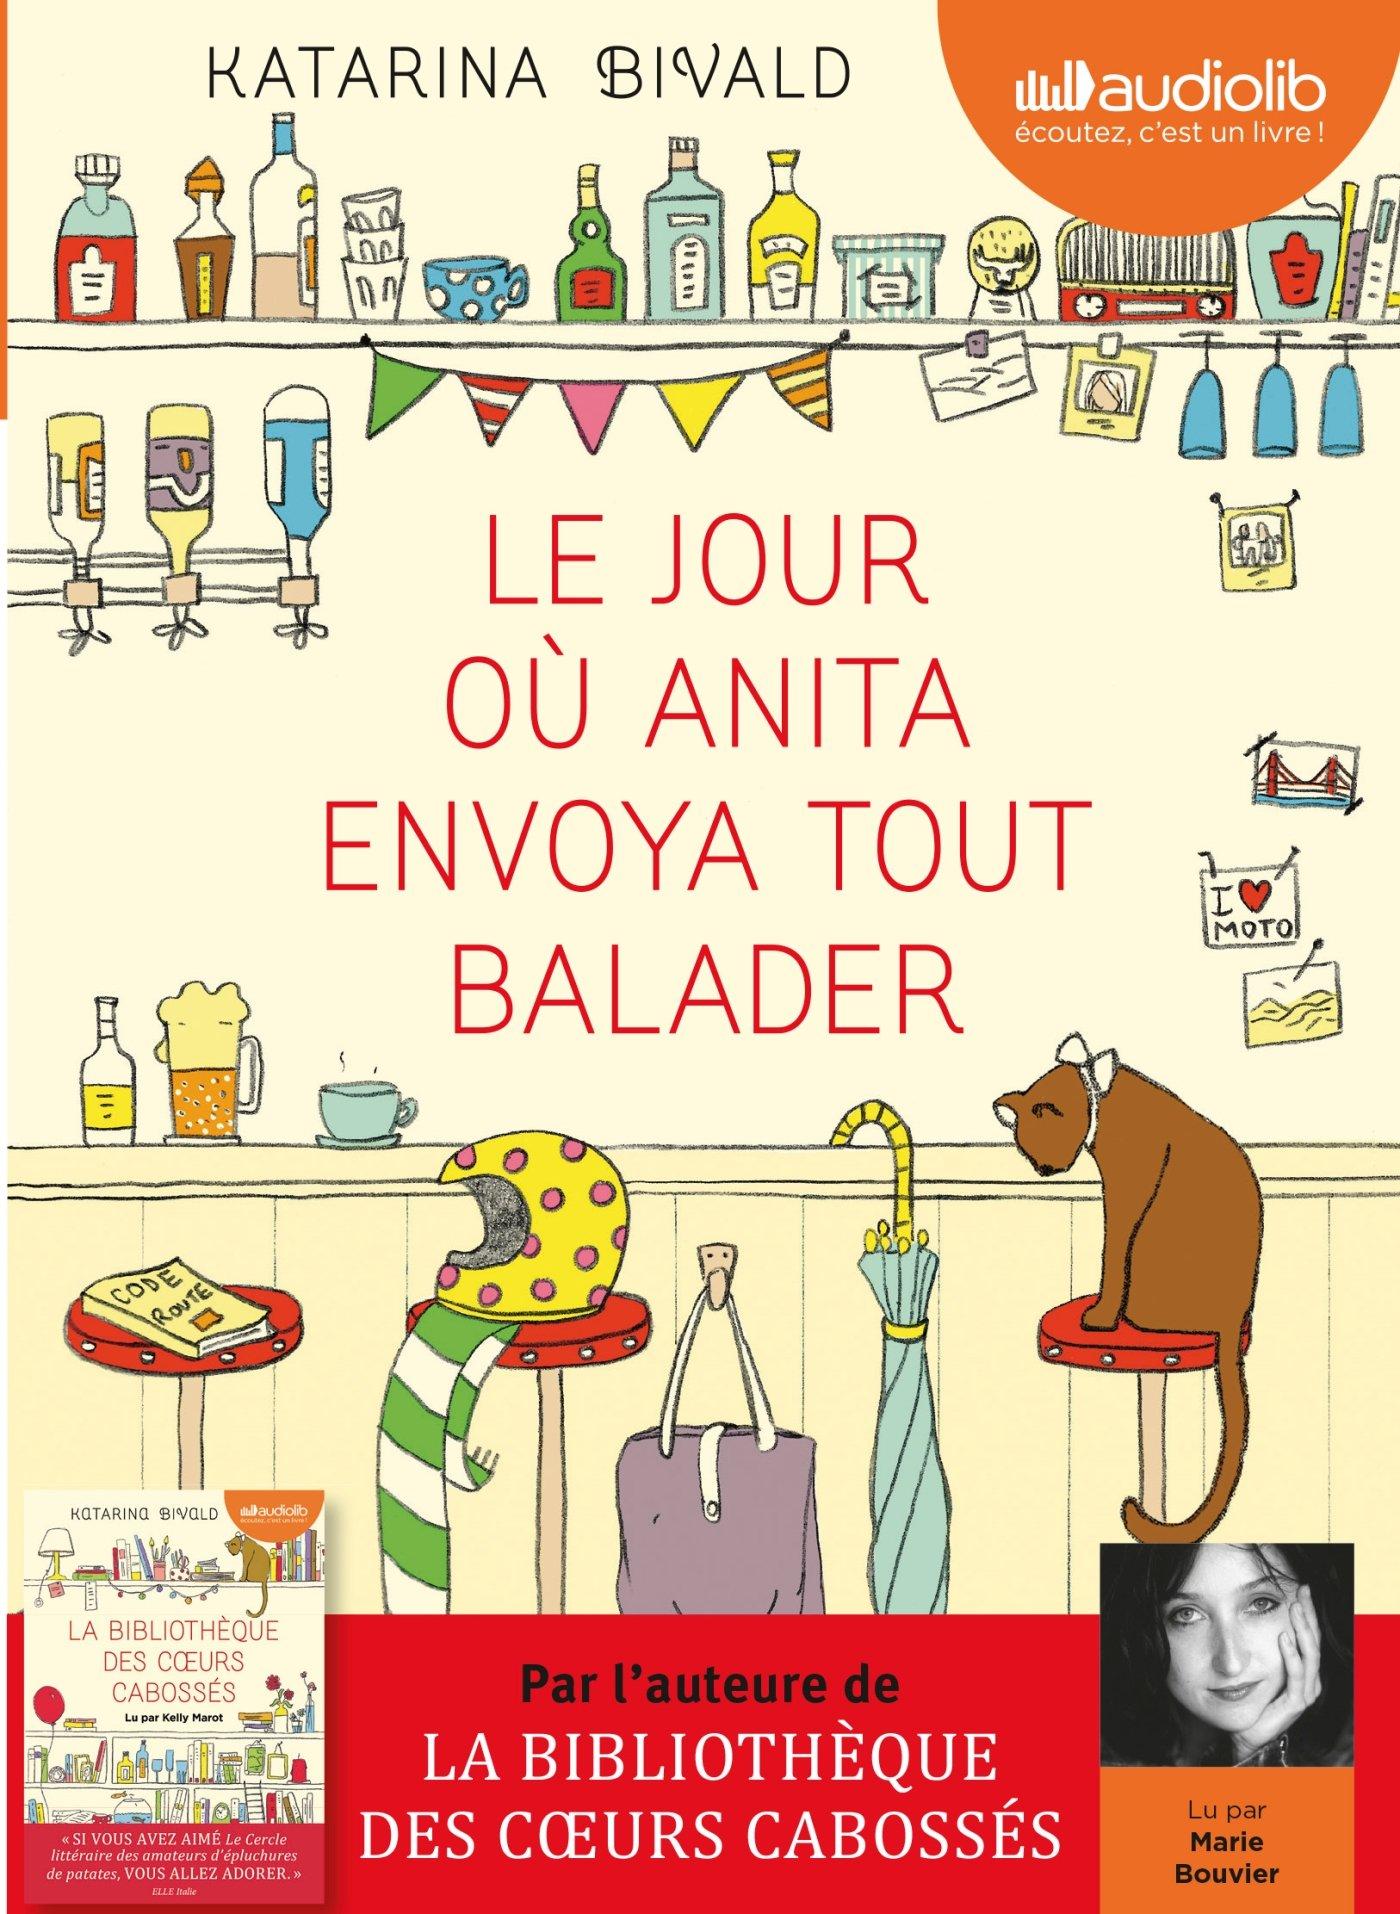 Le Jour Ou Anita Envoya Tout Balader Livre Audio Cd